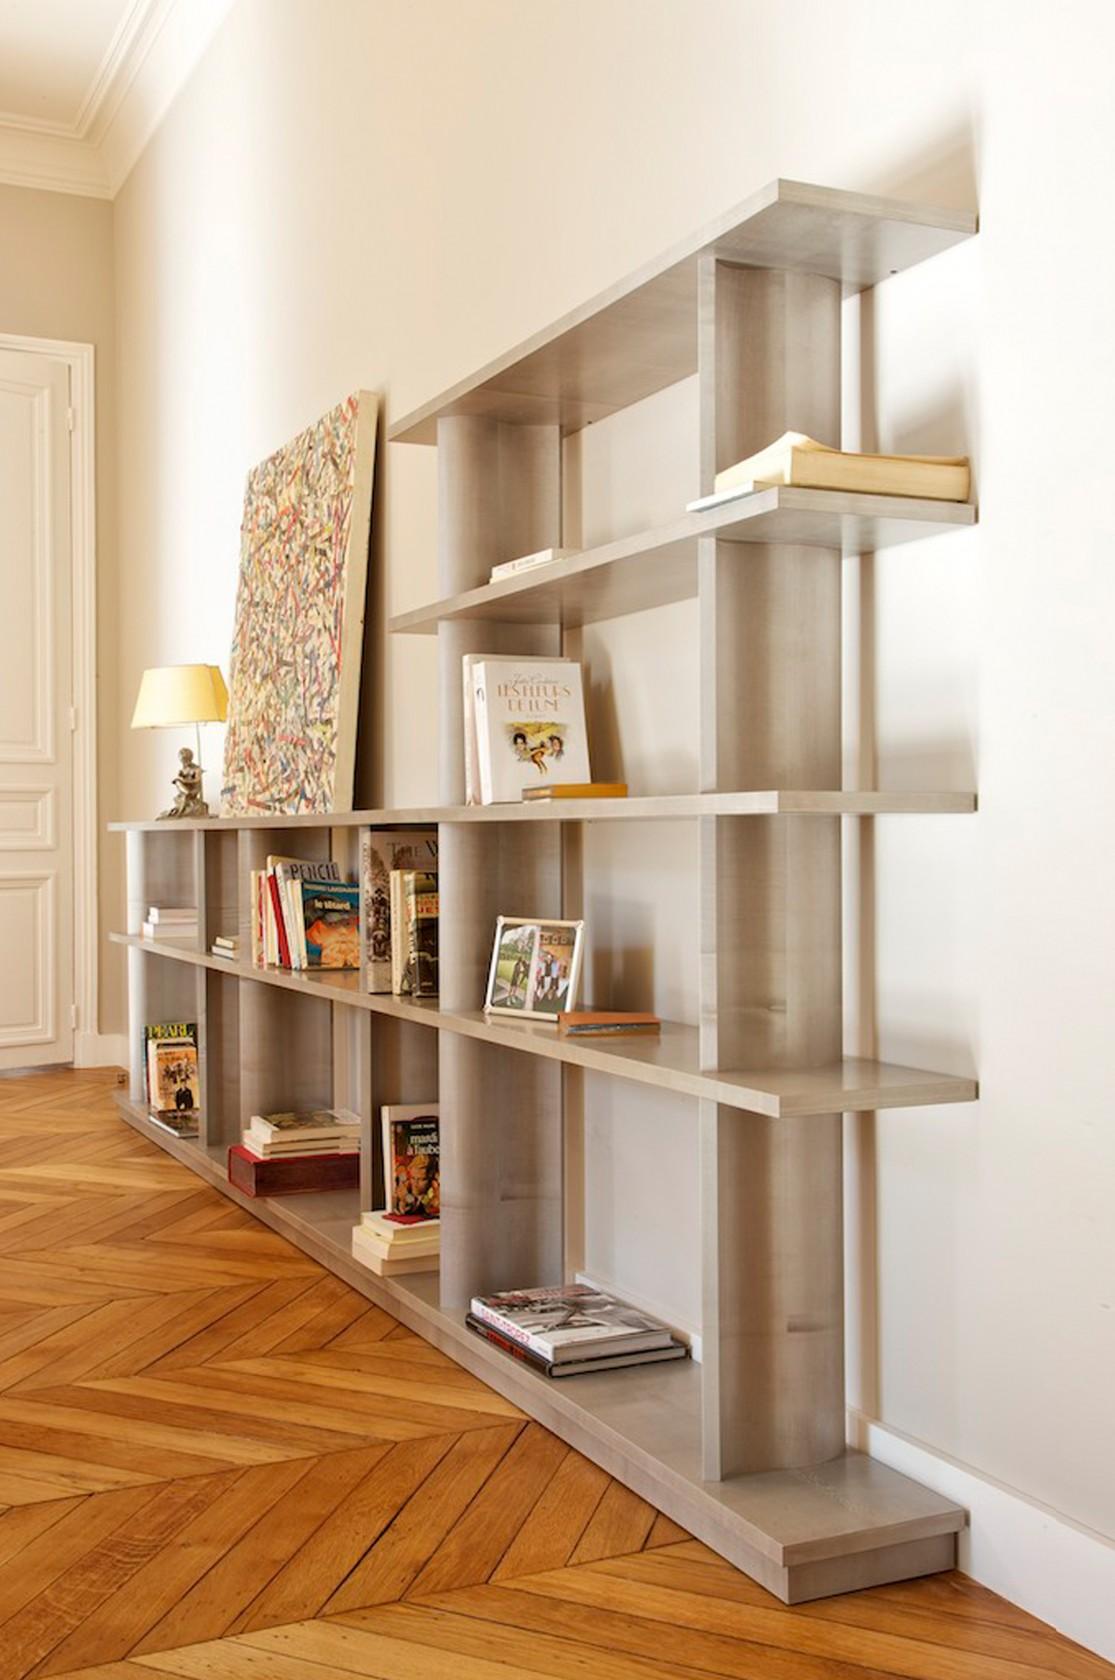 bibliotheque paquebot ludovic avenel